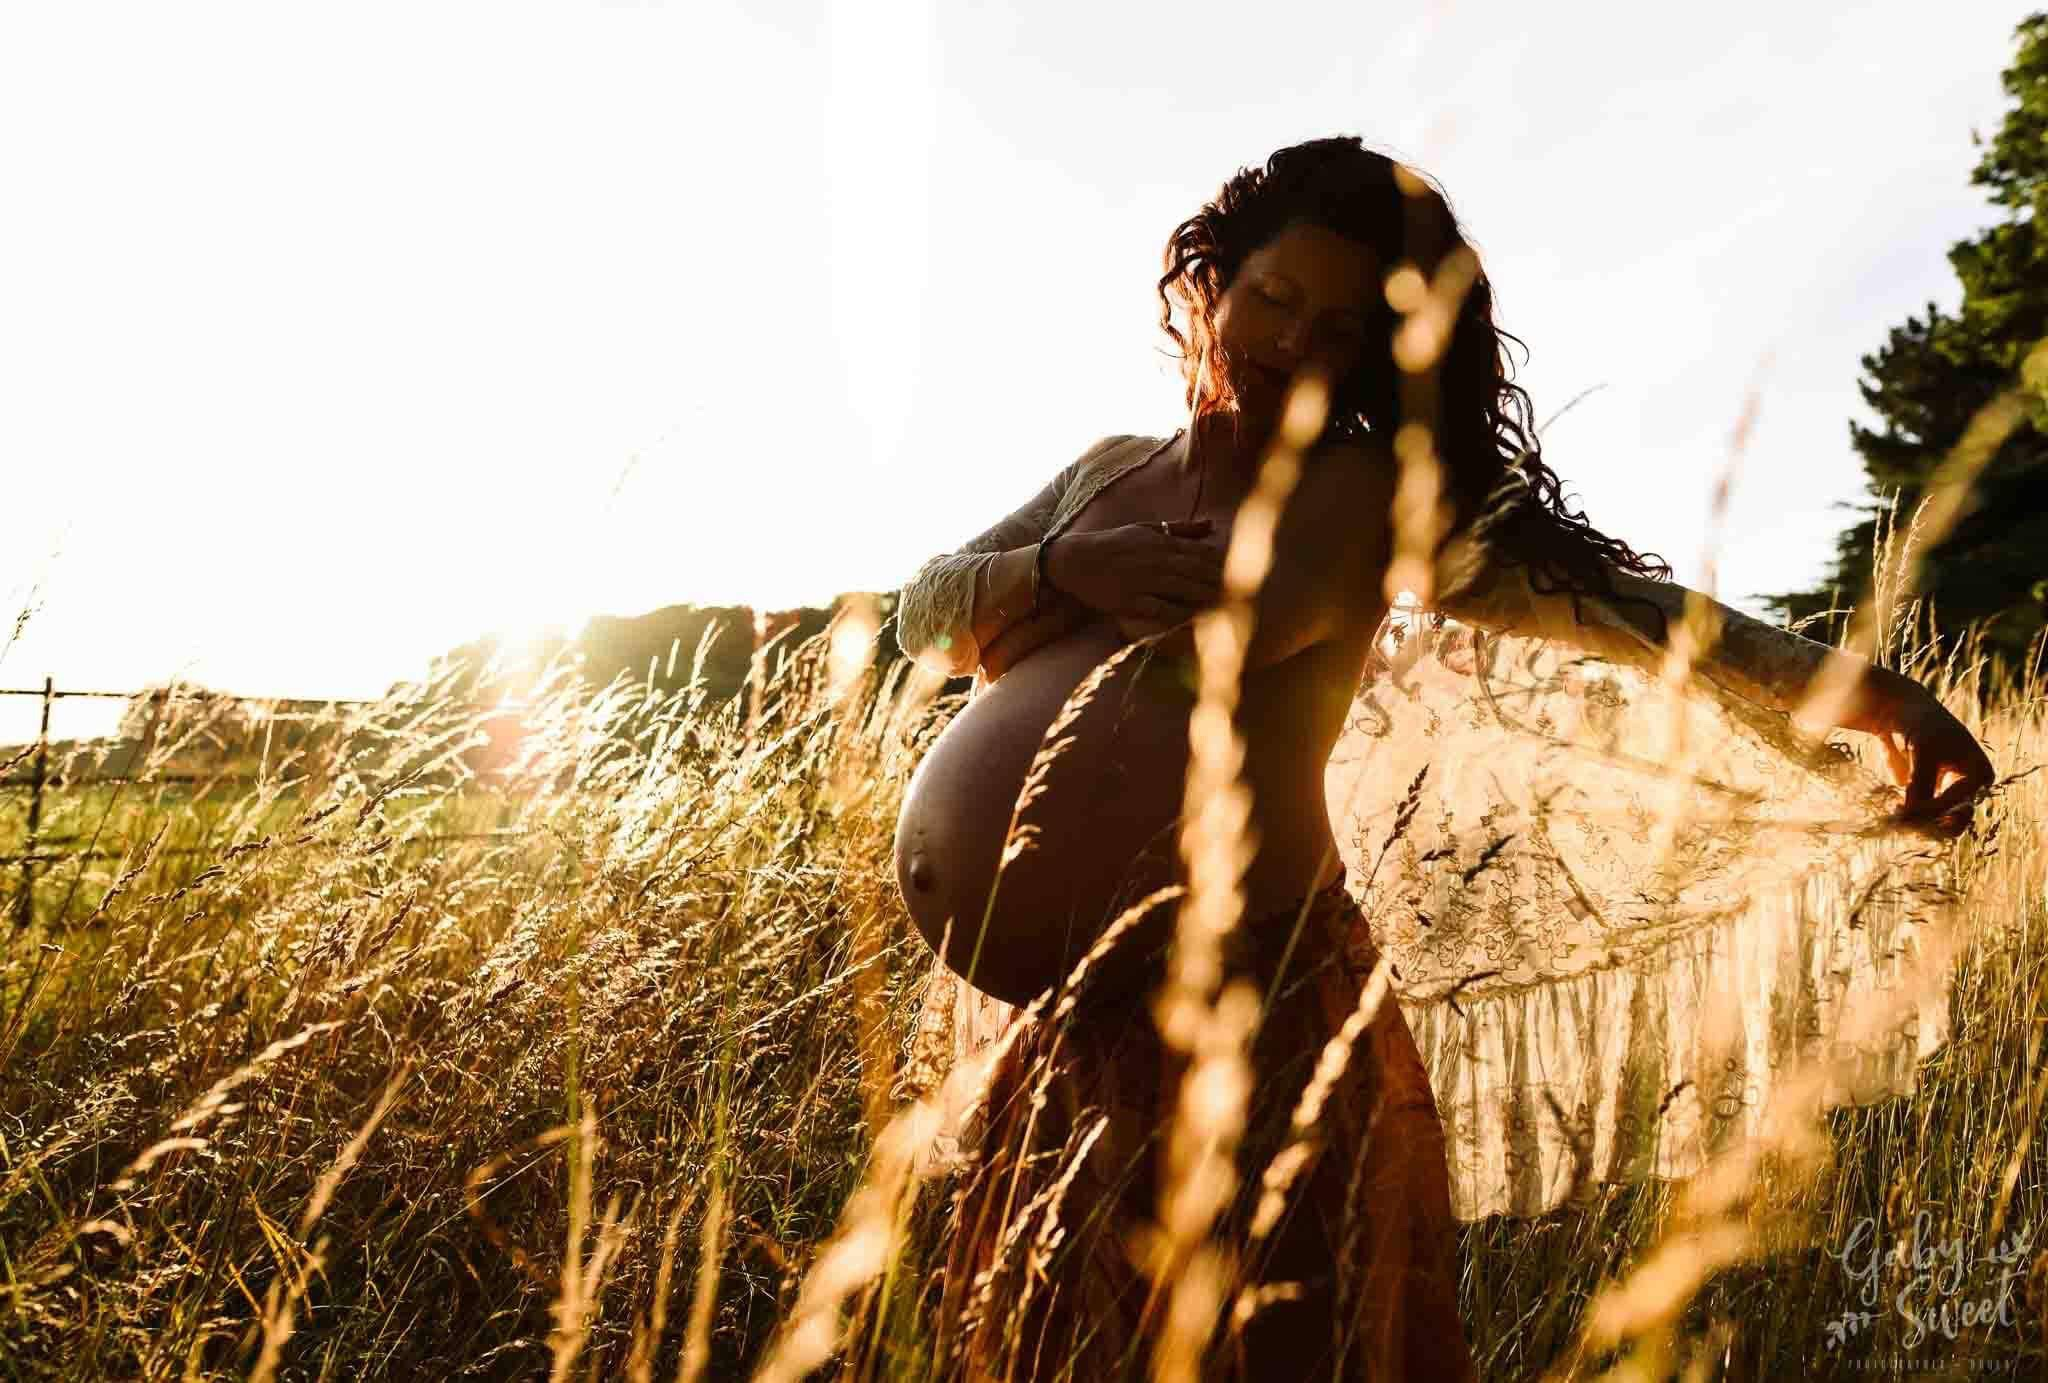 Gaby Sweet - www.gabysweetphotography.com